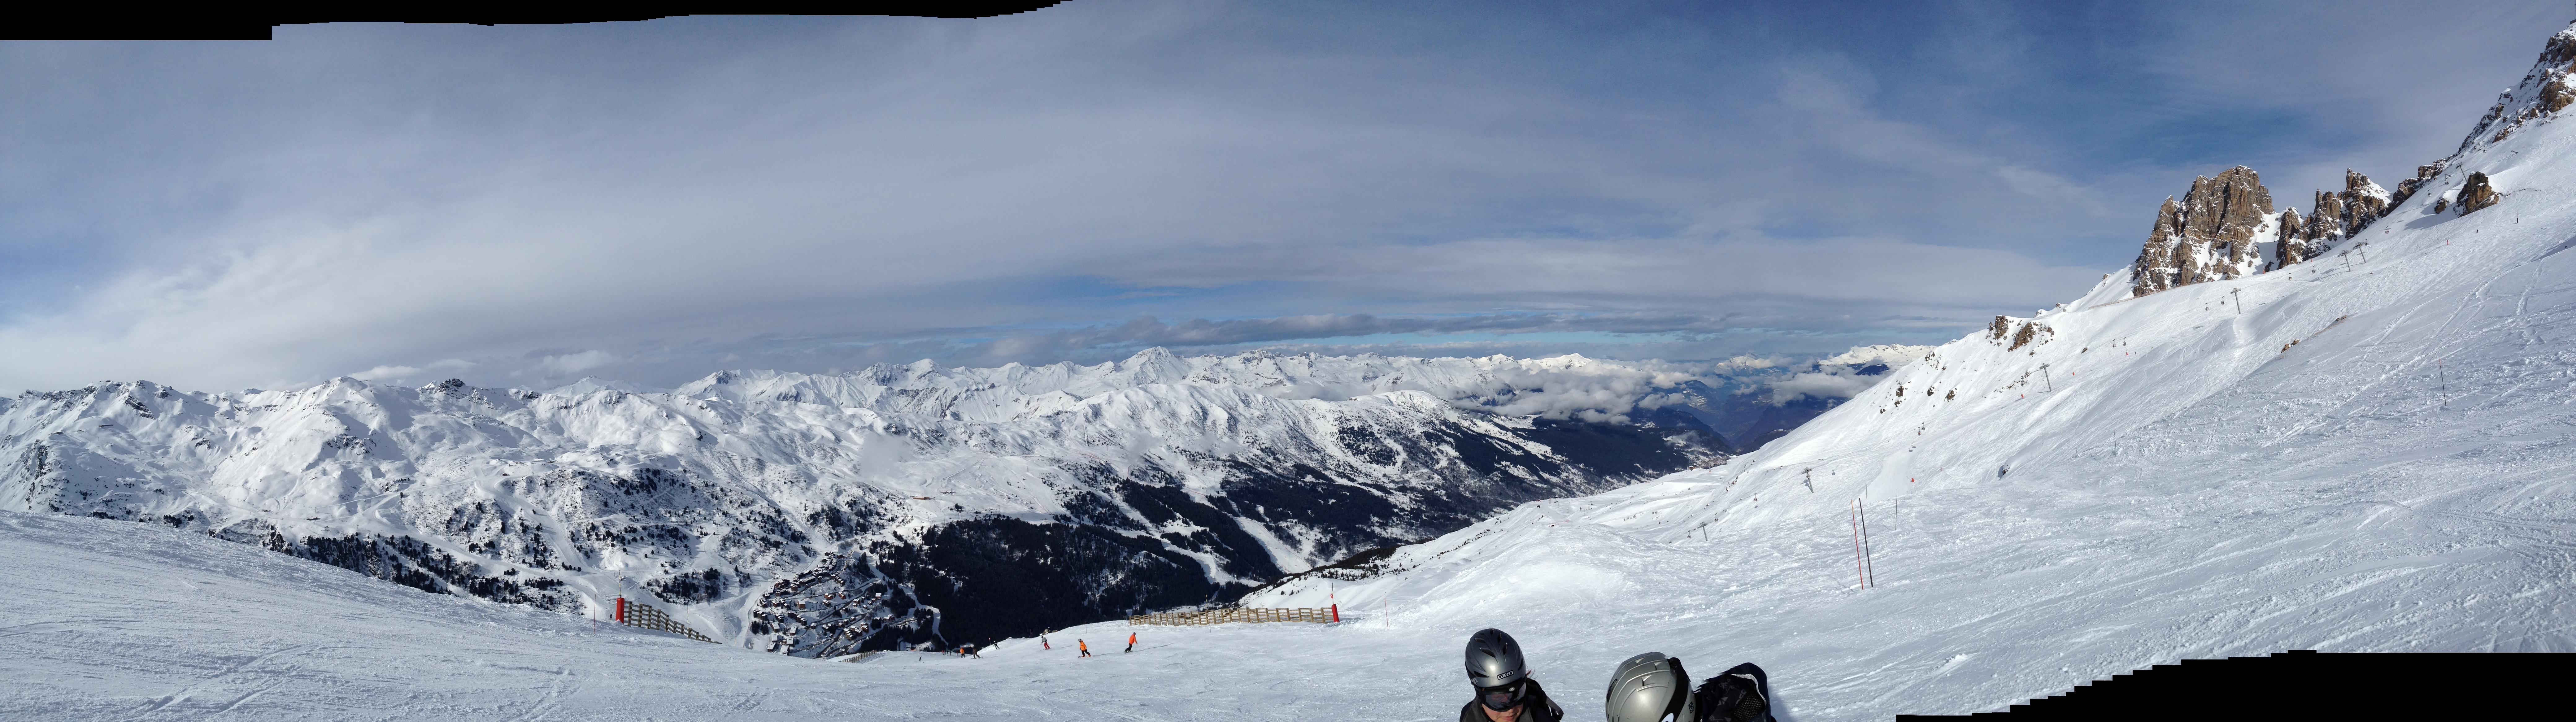 View to Mottaret